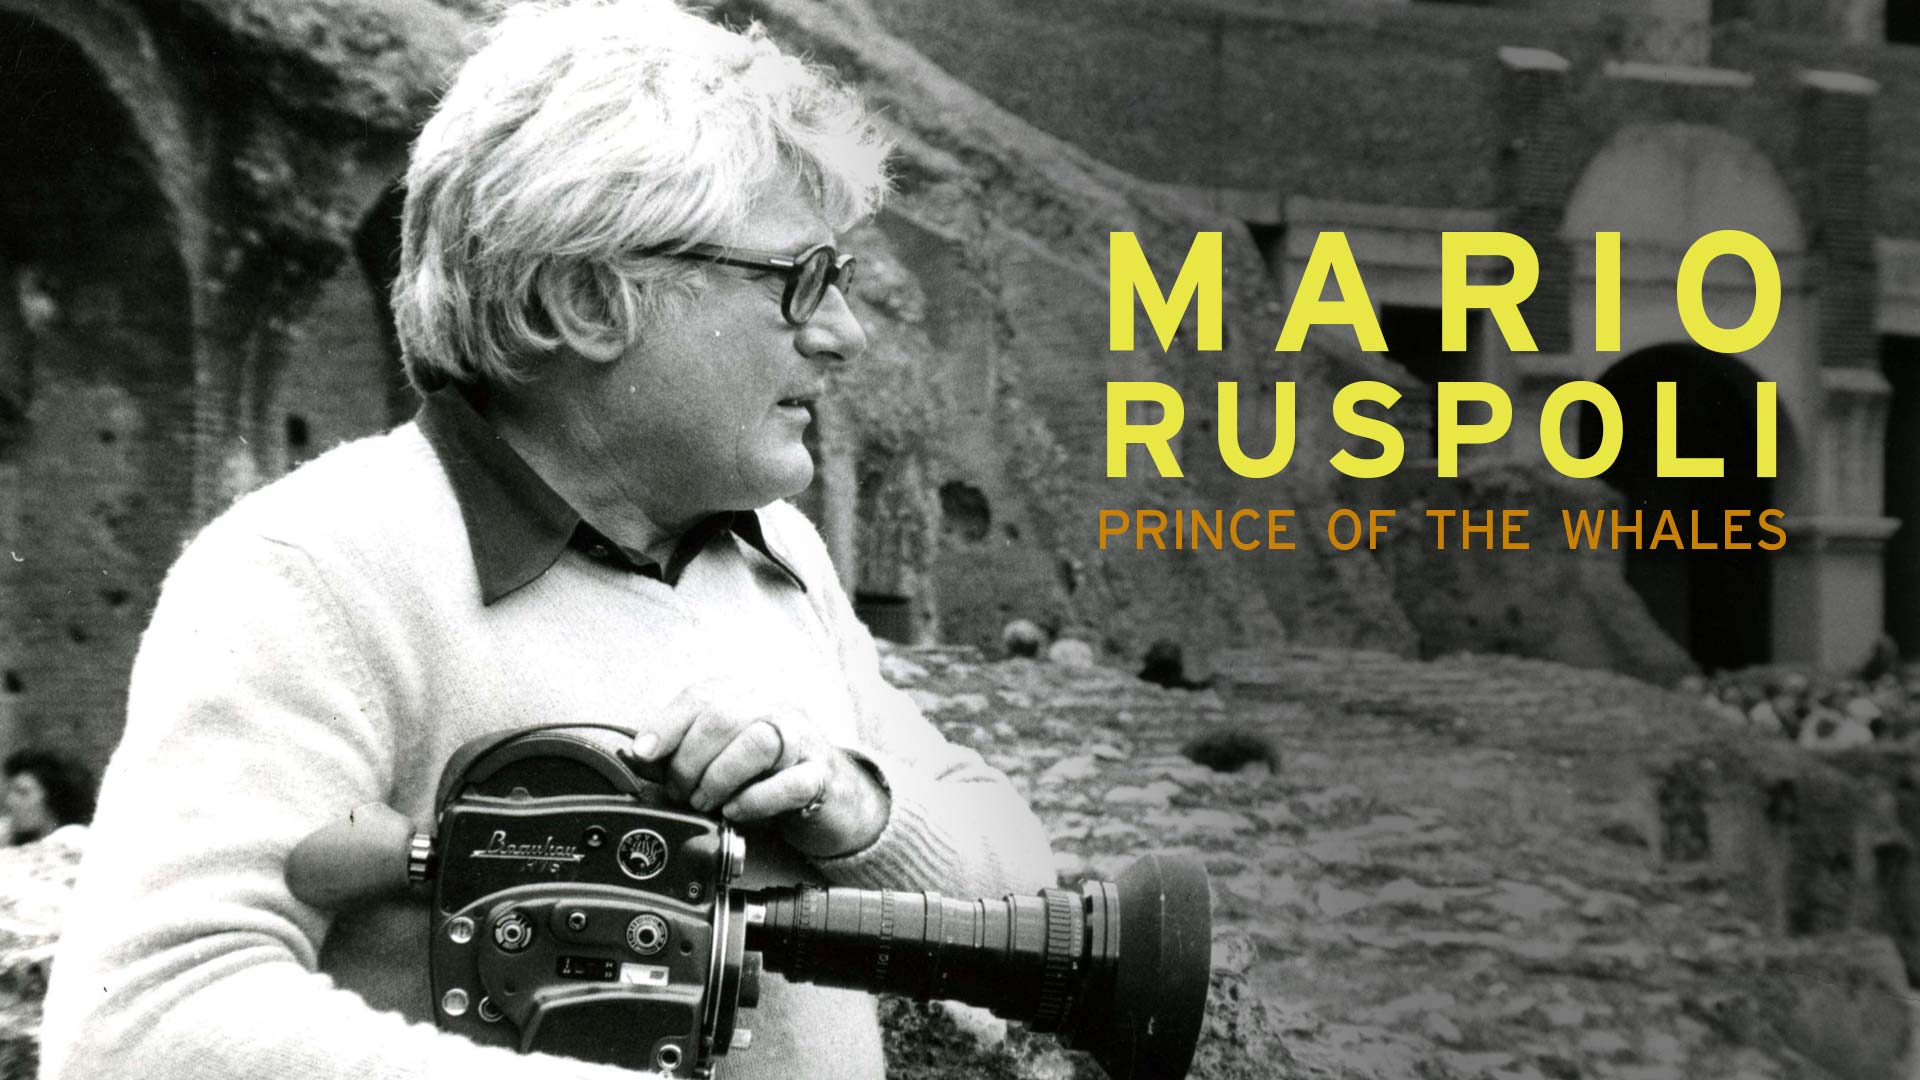 Mario Ruspoli, Prince of the Whales - image